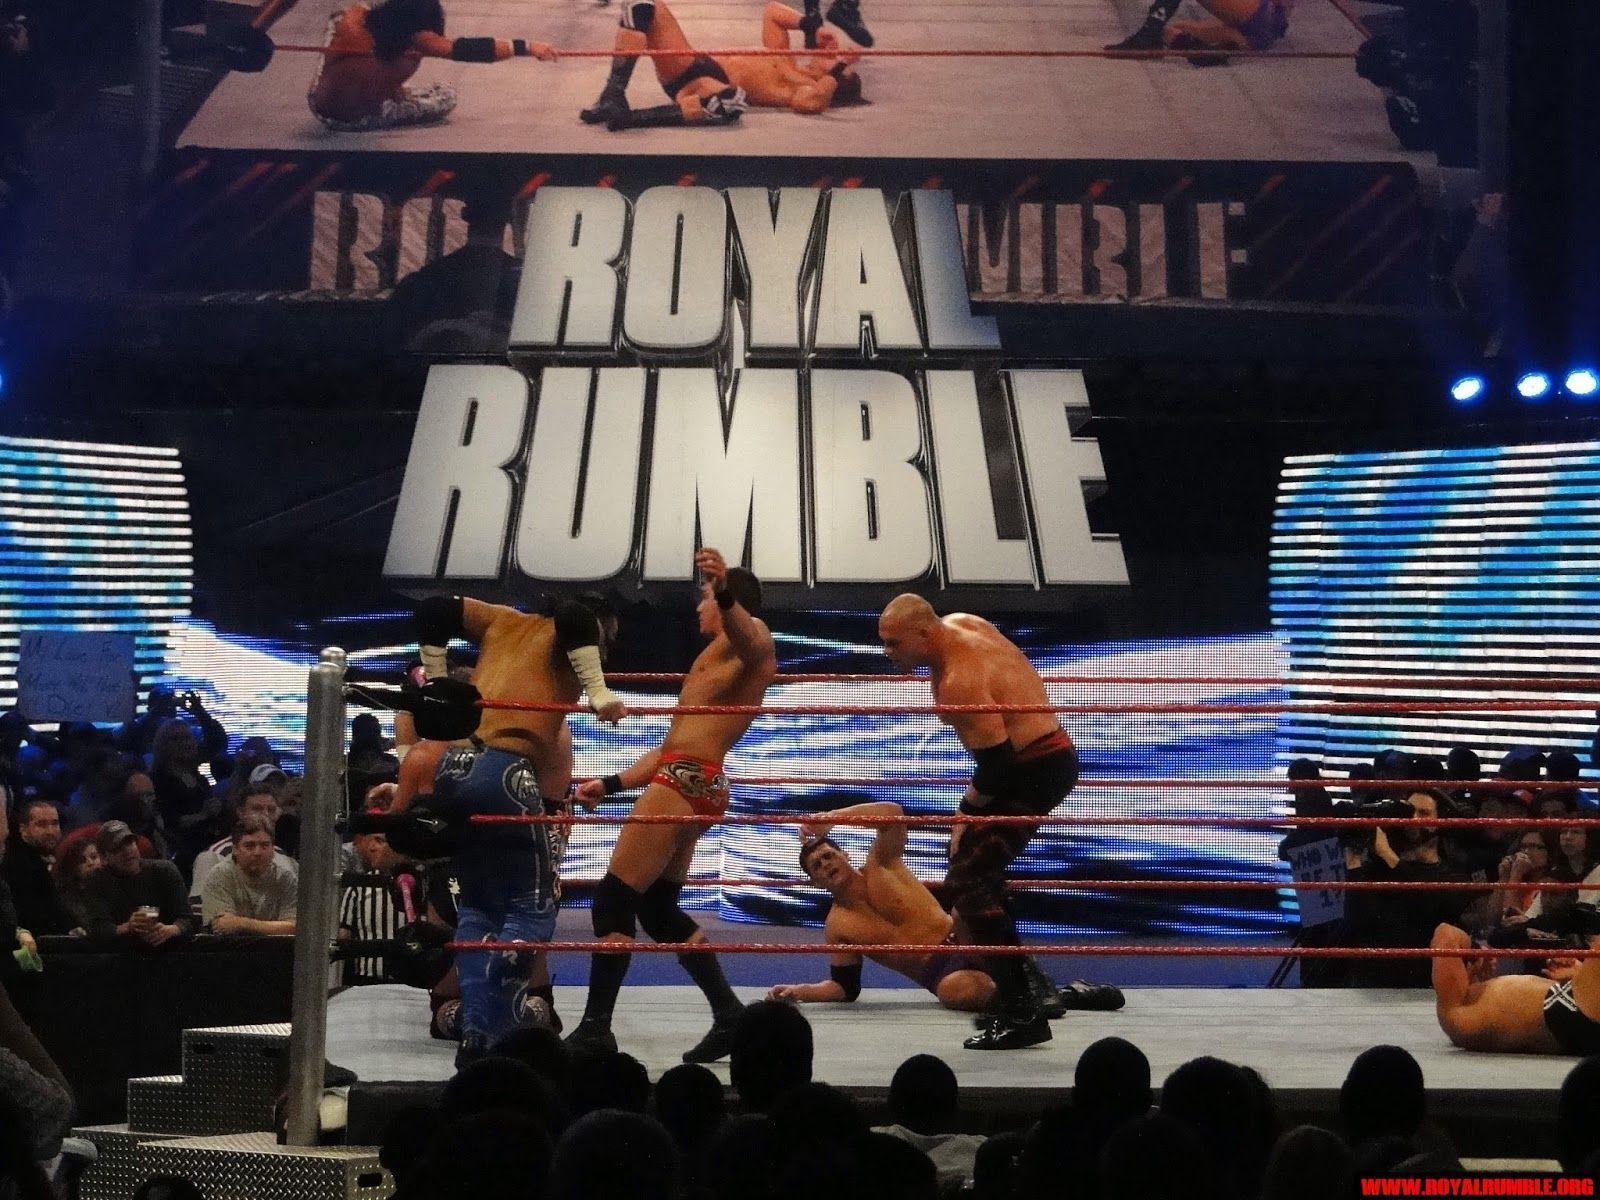 WWE Royal Rumble Wallpapers 2015 #WWE #RoyalRumble #Wallpaper #HD ...